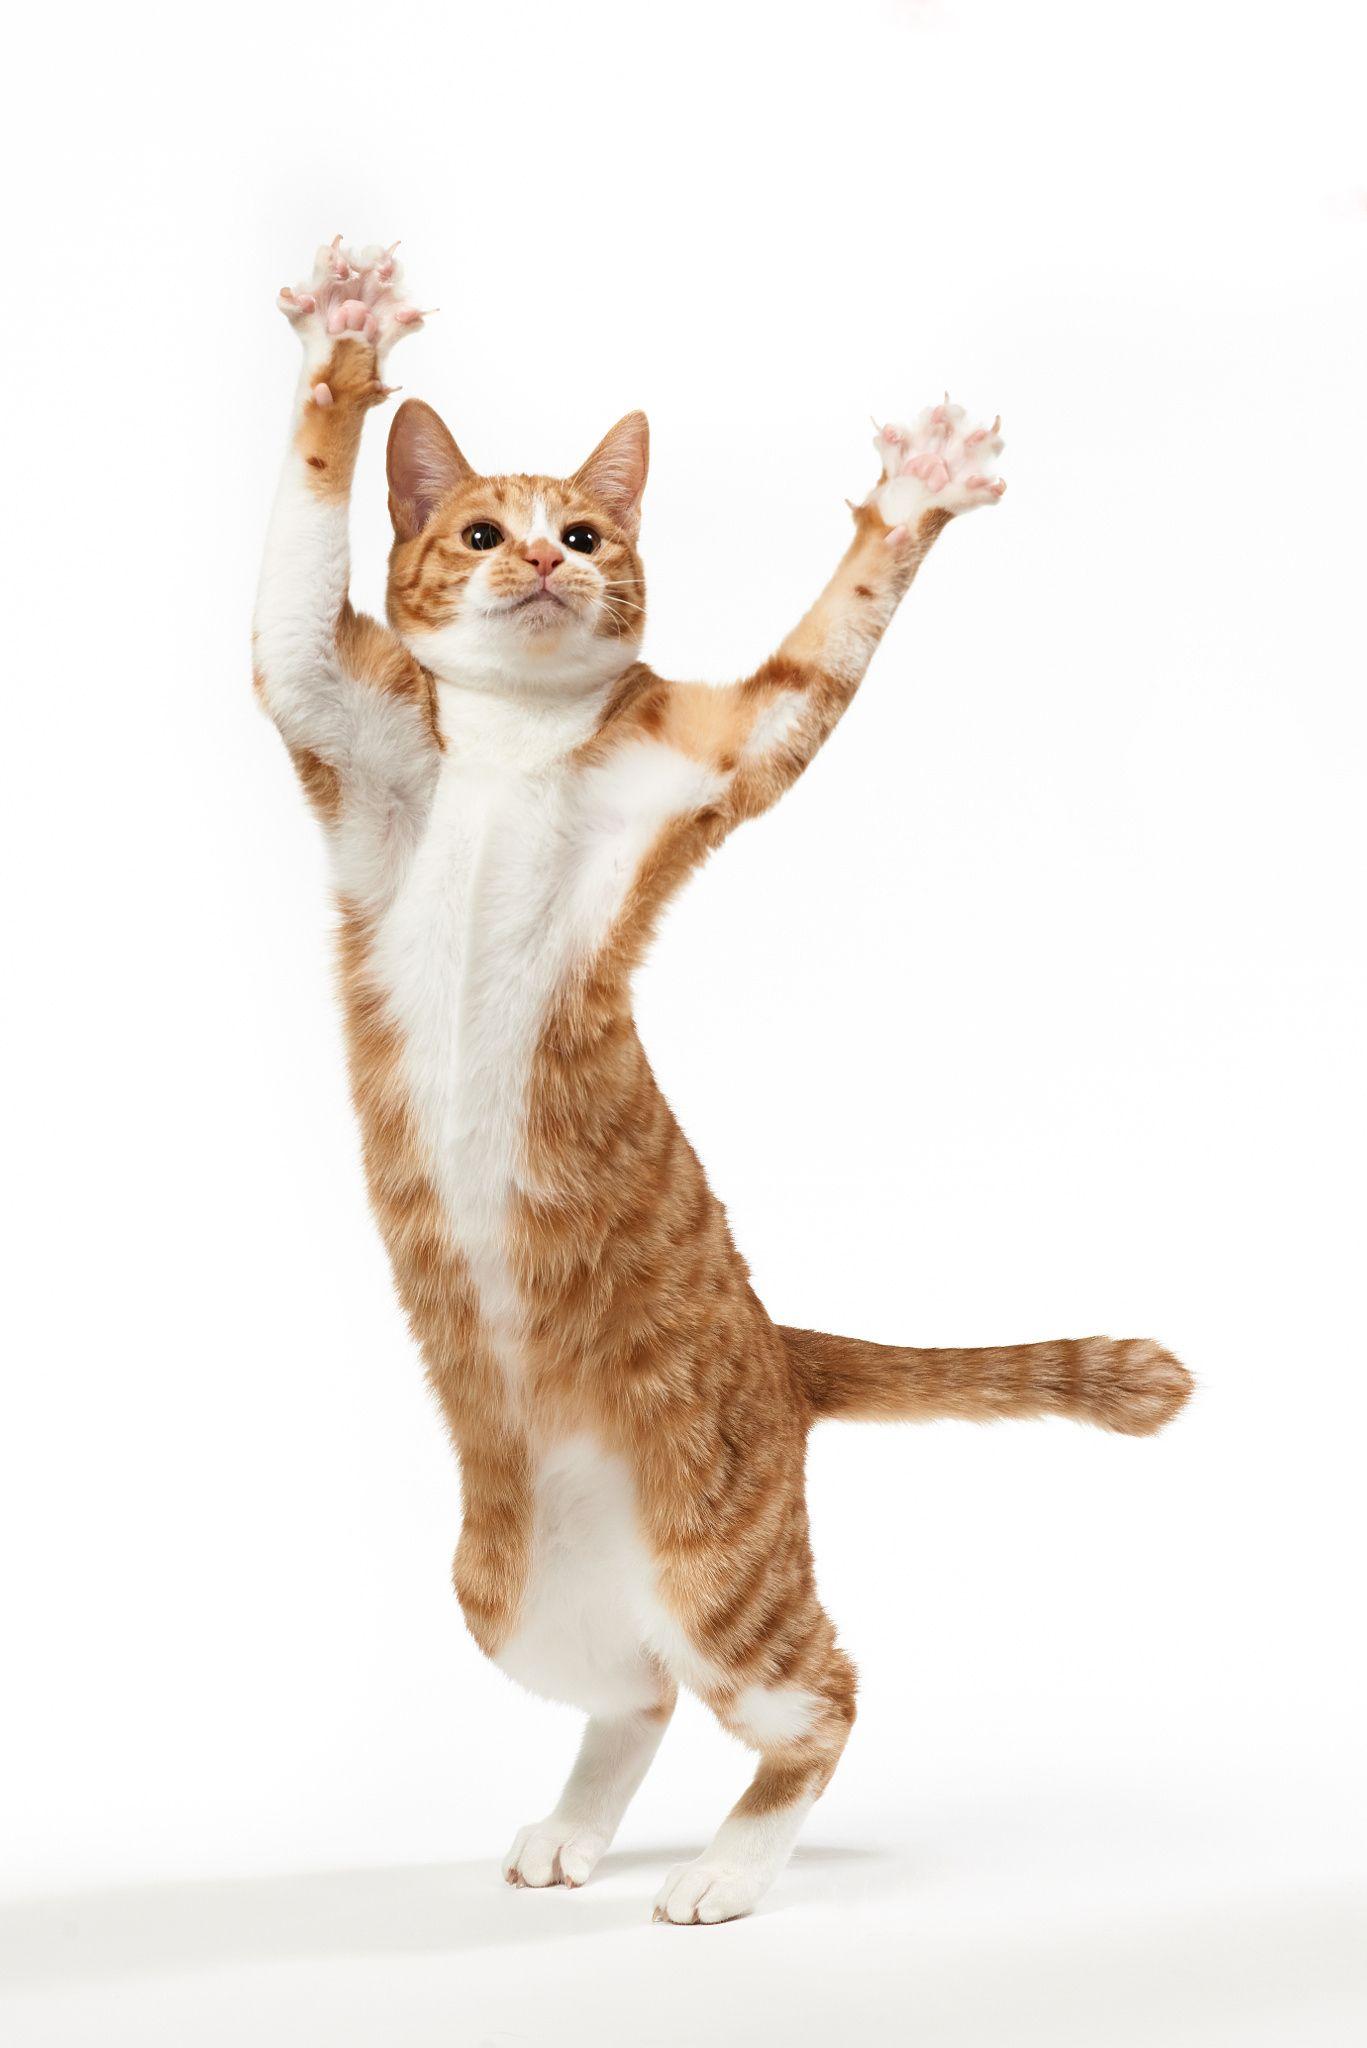 Jazz Hands Cat Pose Cats Cats Illustration